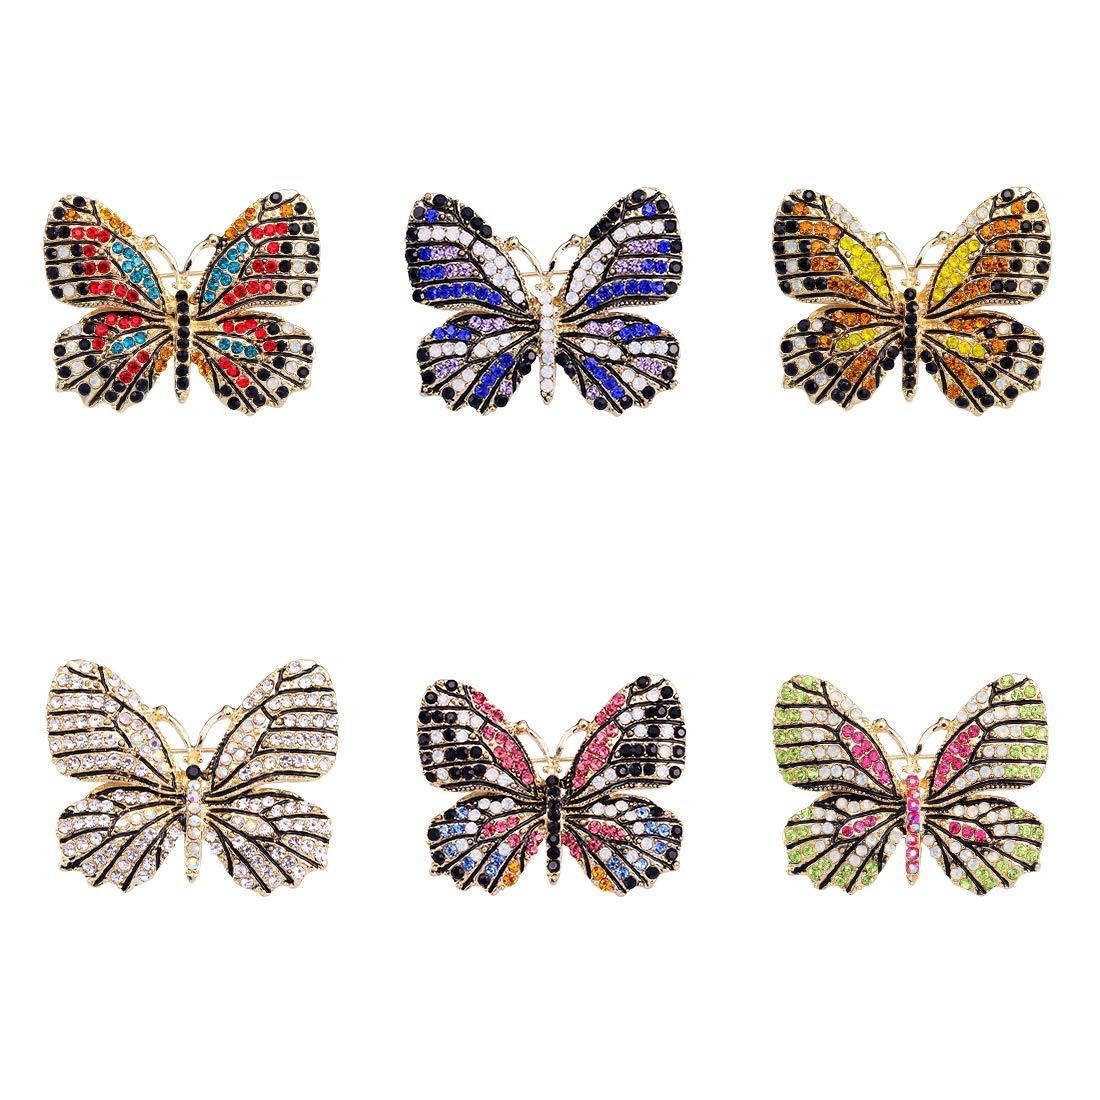 WeimanJewelry Lot6pcs Multicolor Rhinestone Crystal Butterfly Brooch Pin Set for Women